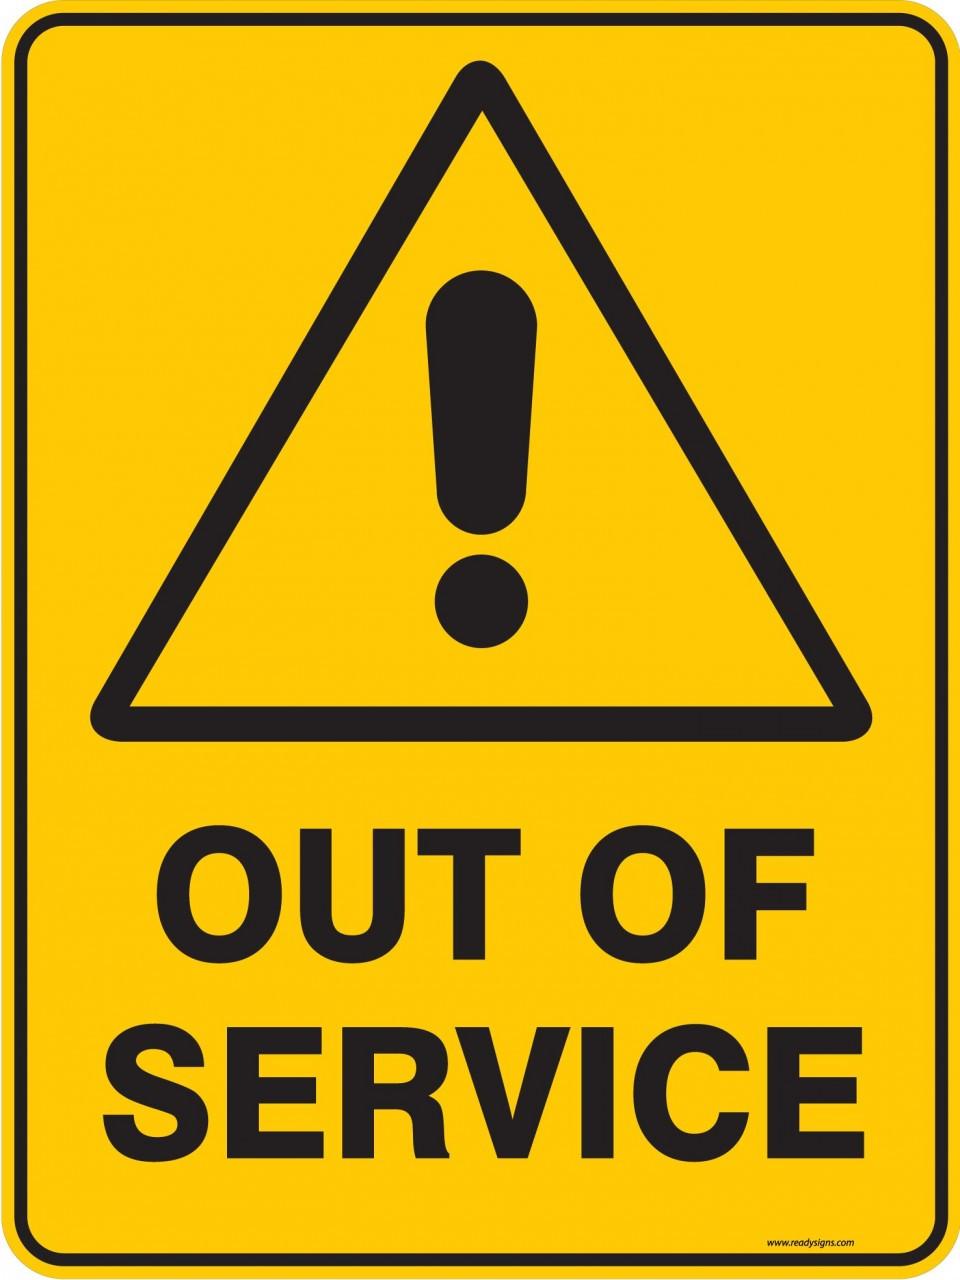 Warning Sign - O...I 95 Exit 29